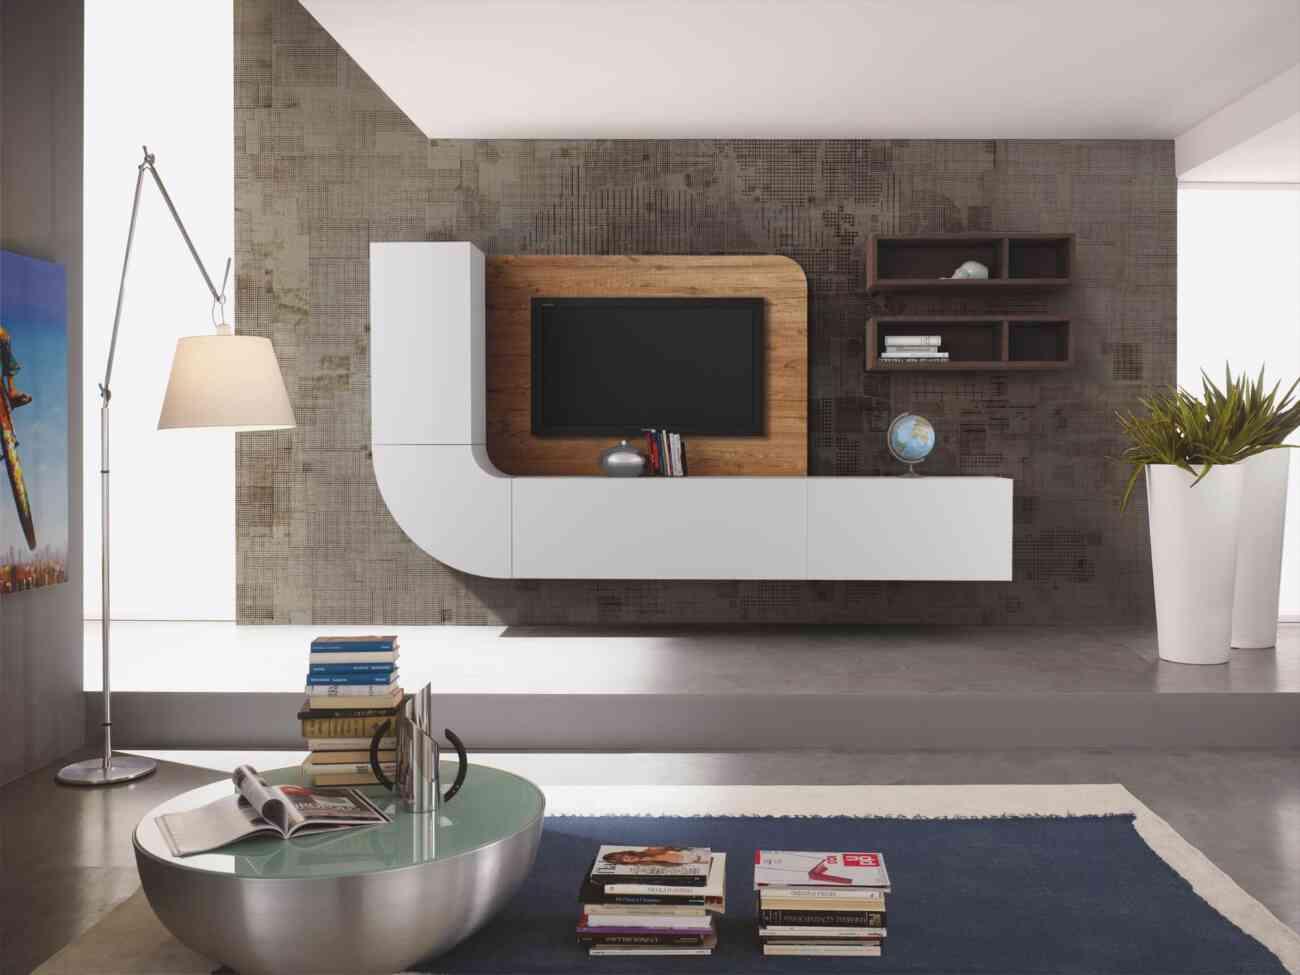 Sistemi giorno velvet artigian mobili gruppo inventa for Mobili particolari moderni